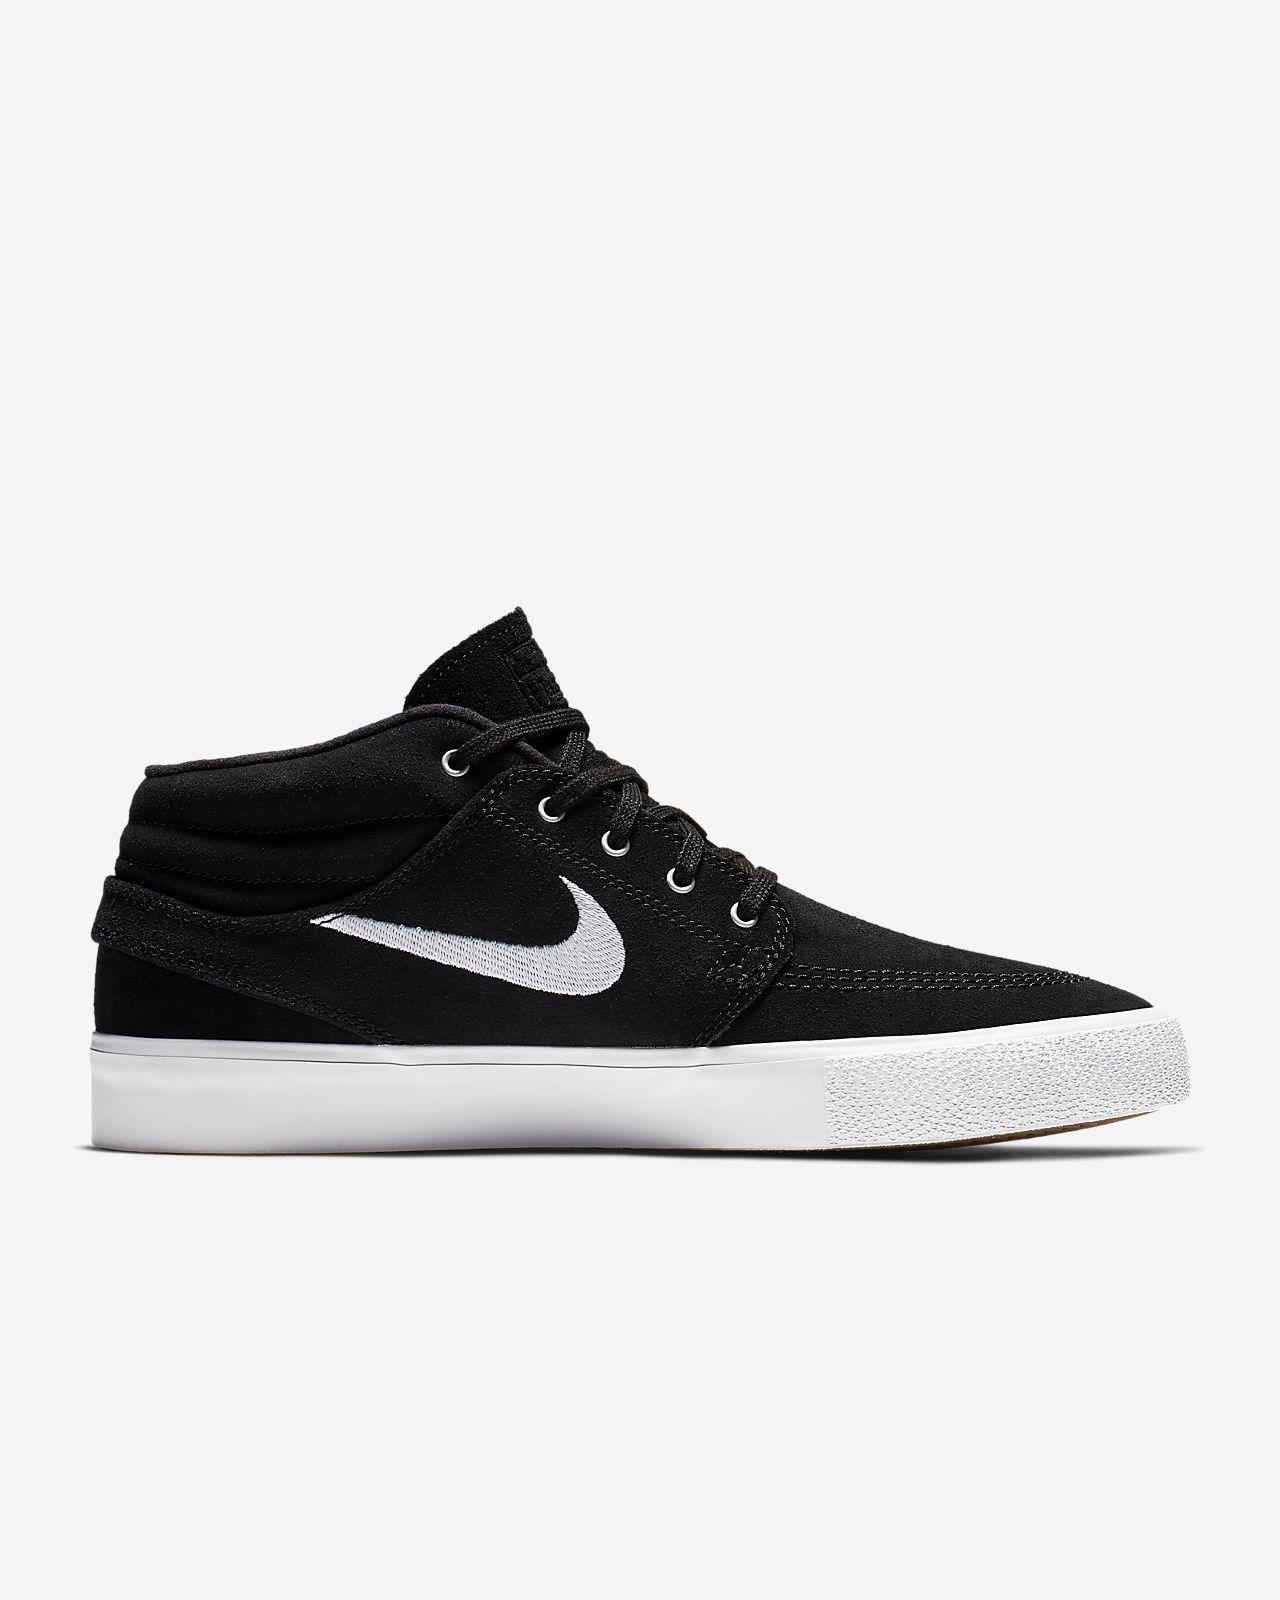 wholesale dealer 2bfd2 5d576 Nike SB Zoom Stefan Janoski Mid RM Skate Shoe. Nike.com